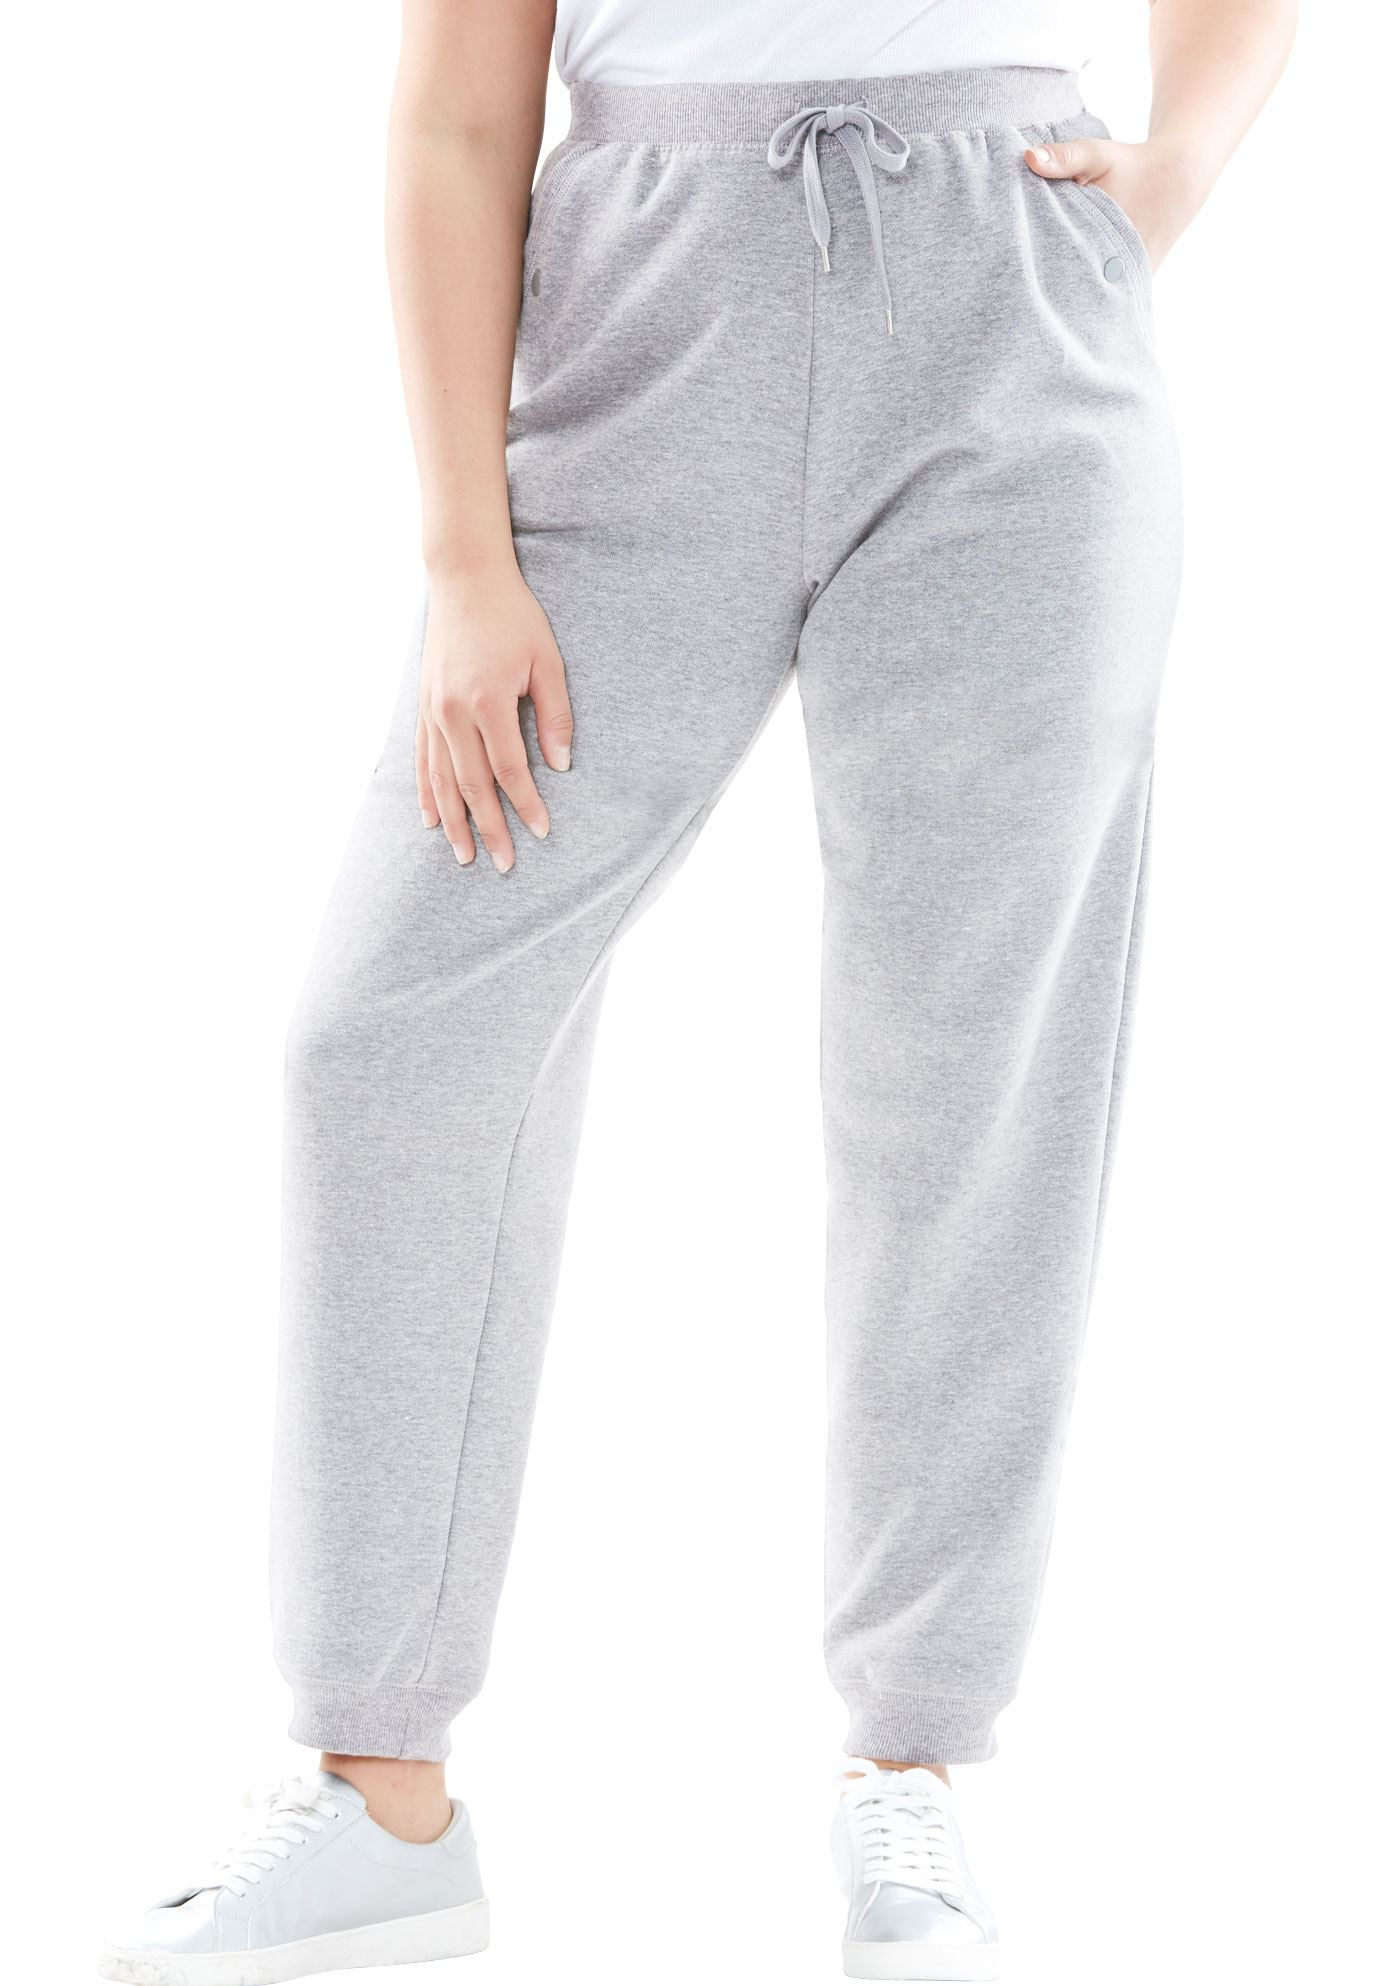 273d329341f5b Petite Fleece Jogger Sweatpants - Women's Plus Size Clothing ...